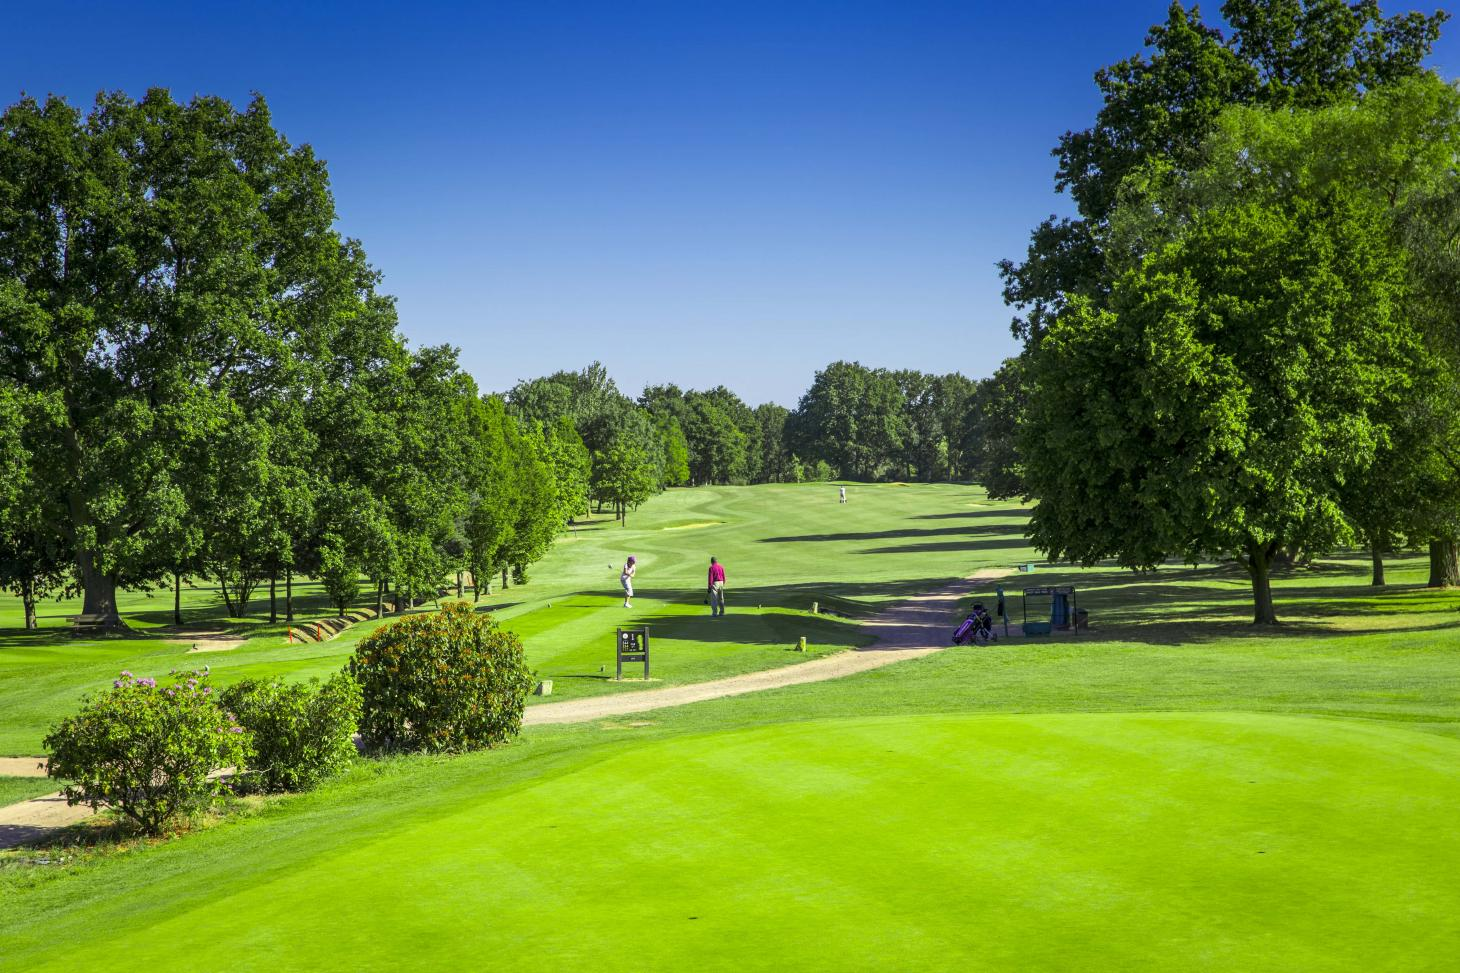 Hendon Golf Club 18 hole golf course